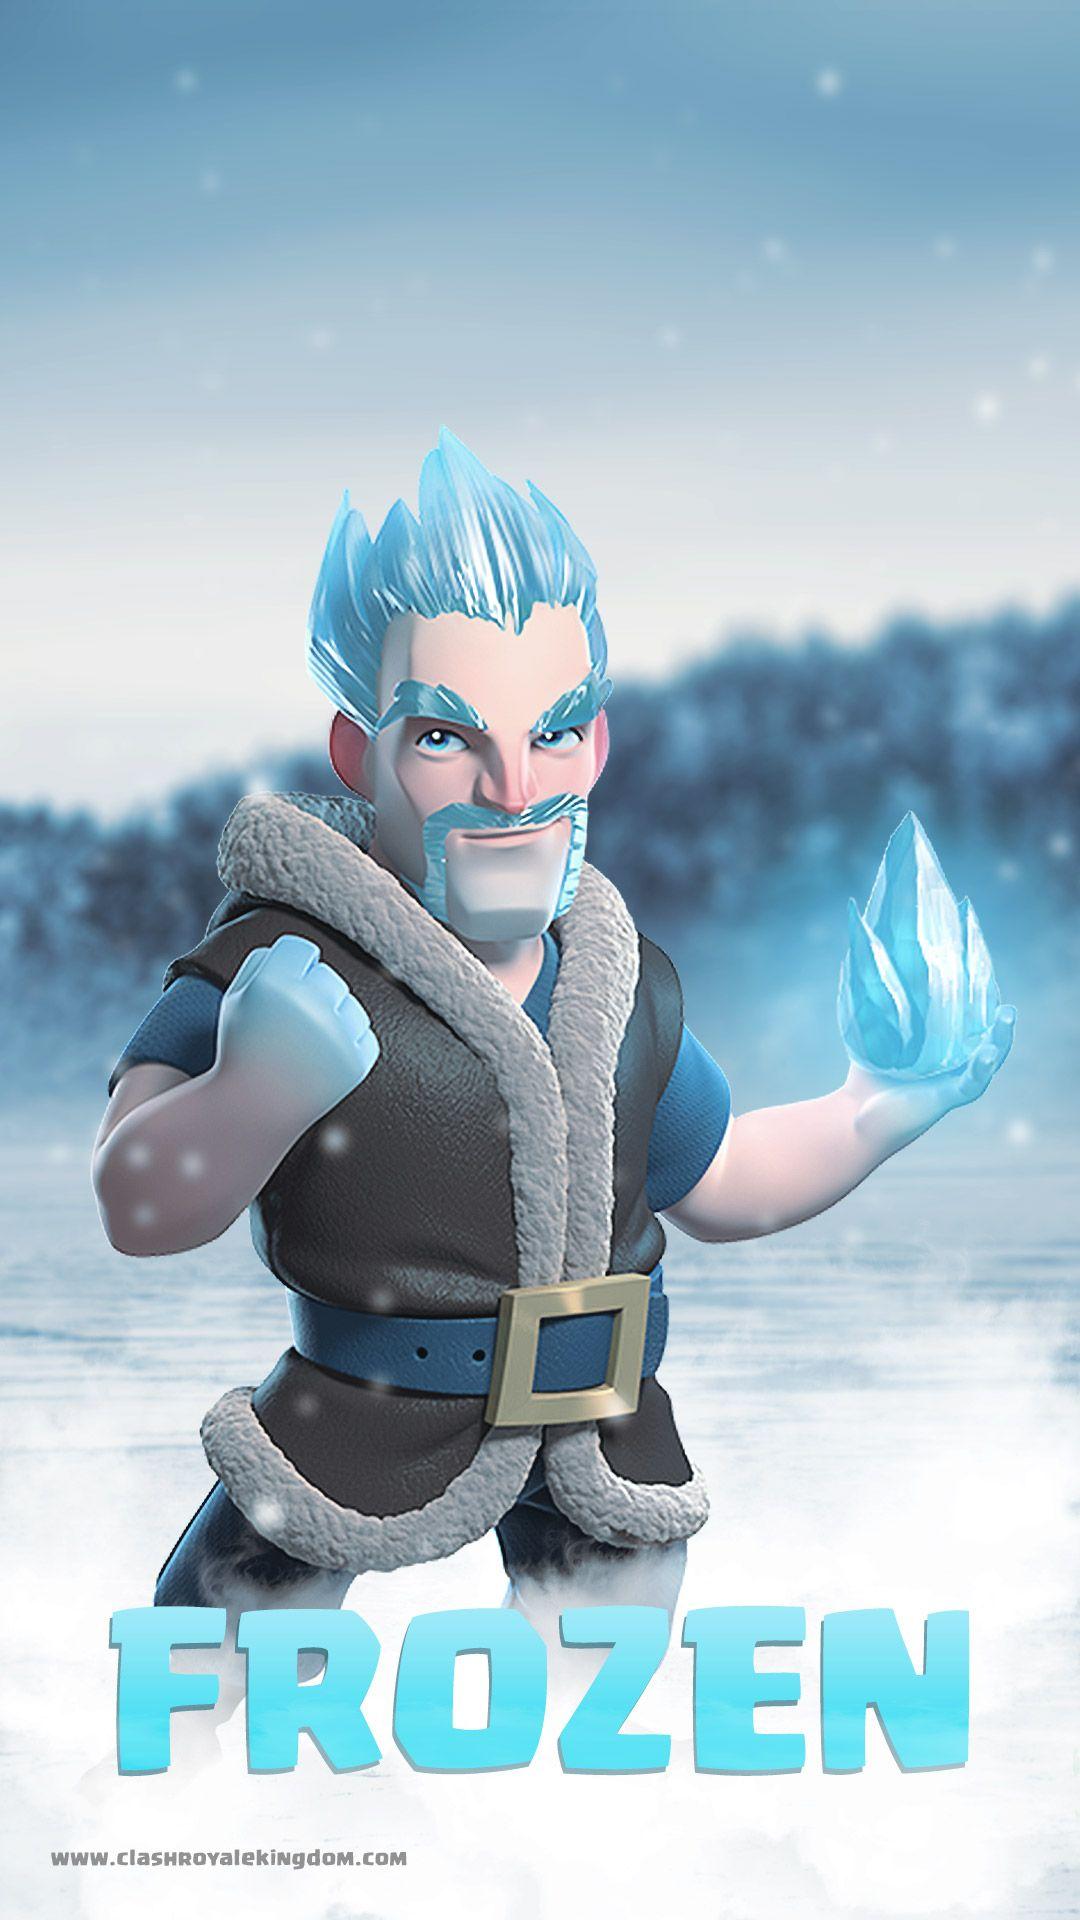 Clash Royale Wallpaper Ice Wizard Clash Royale Clash Of